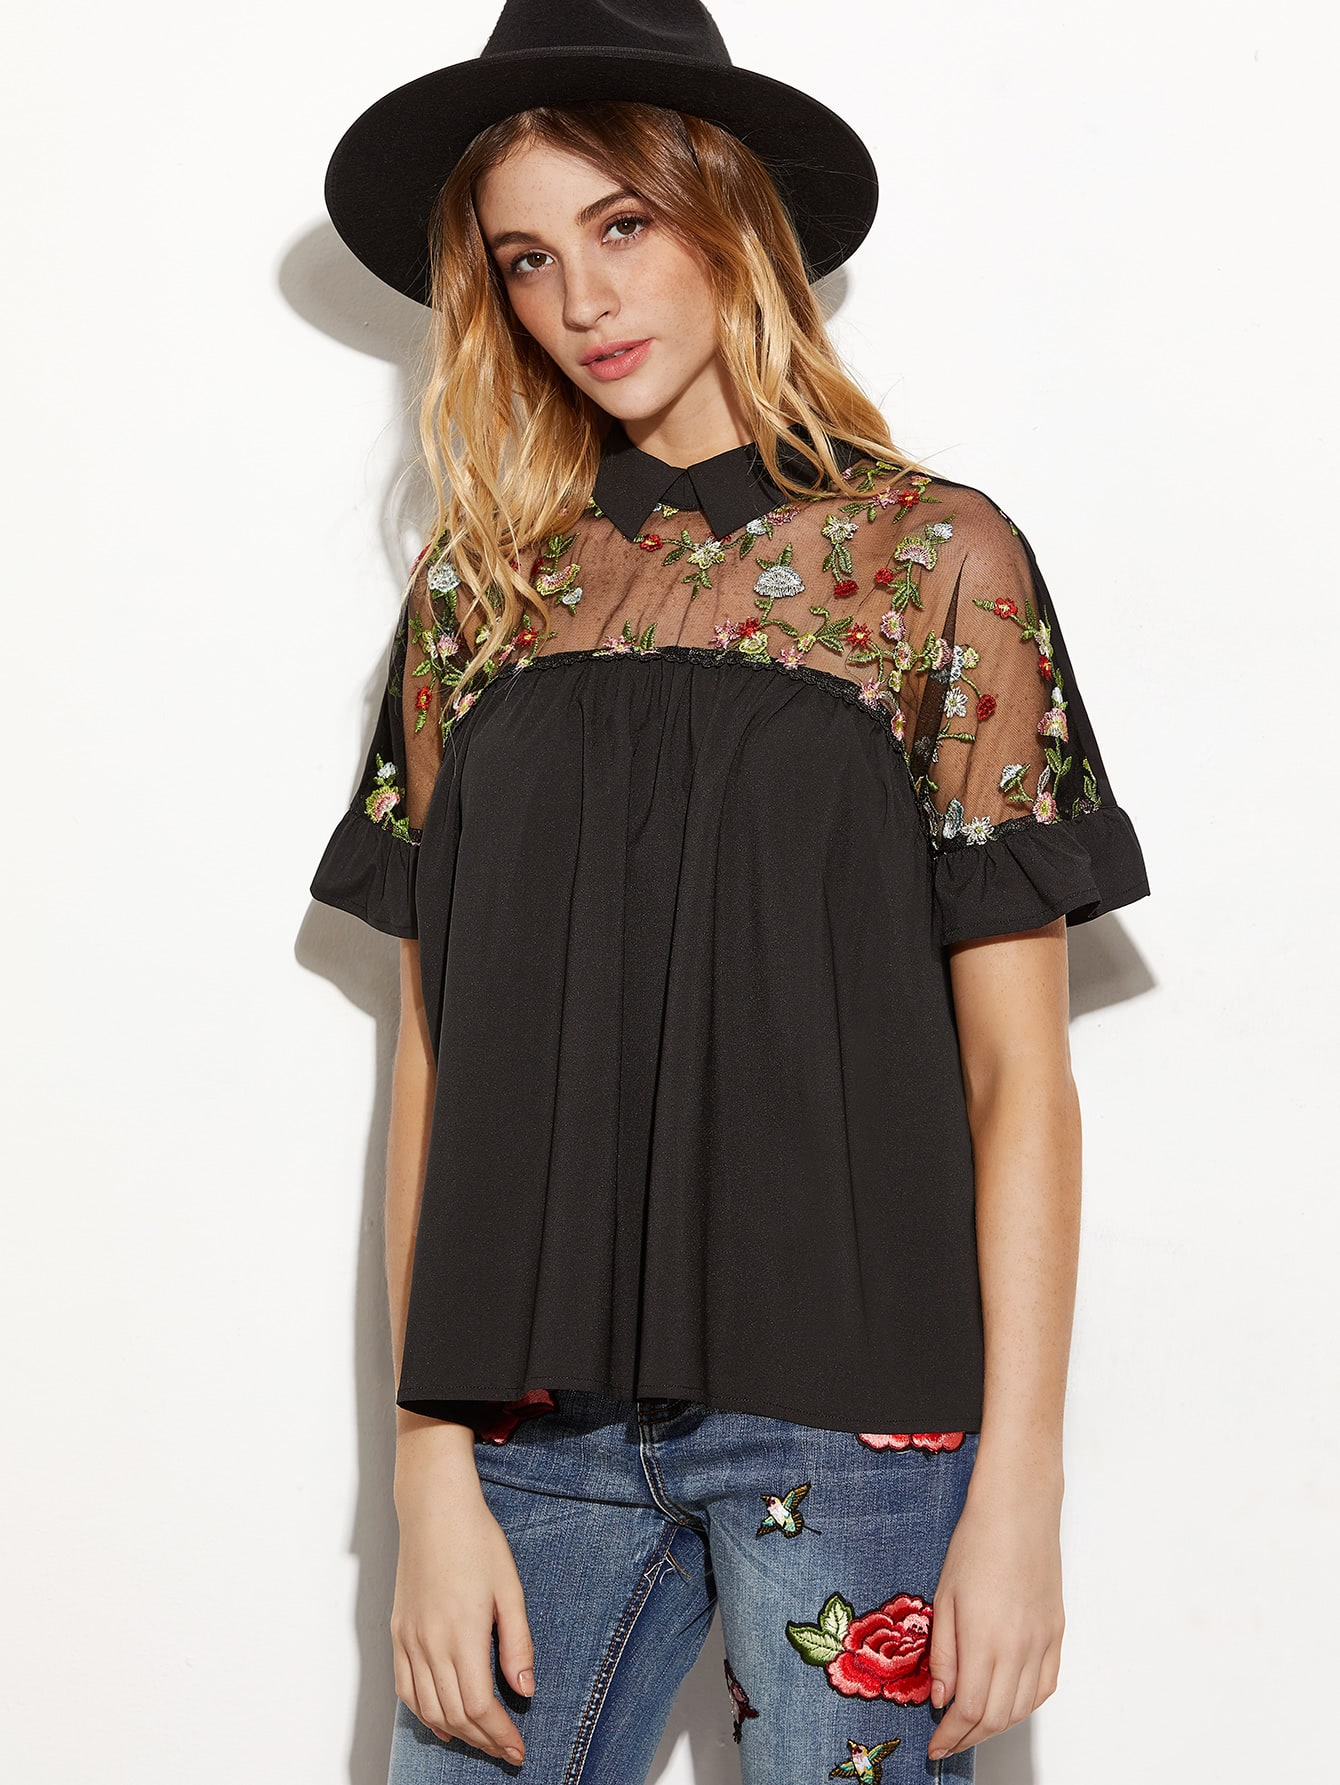 blouse161118712_2